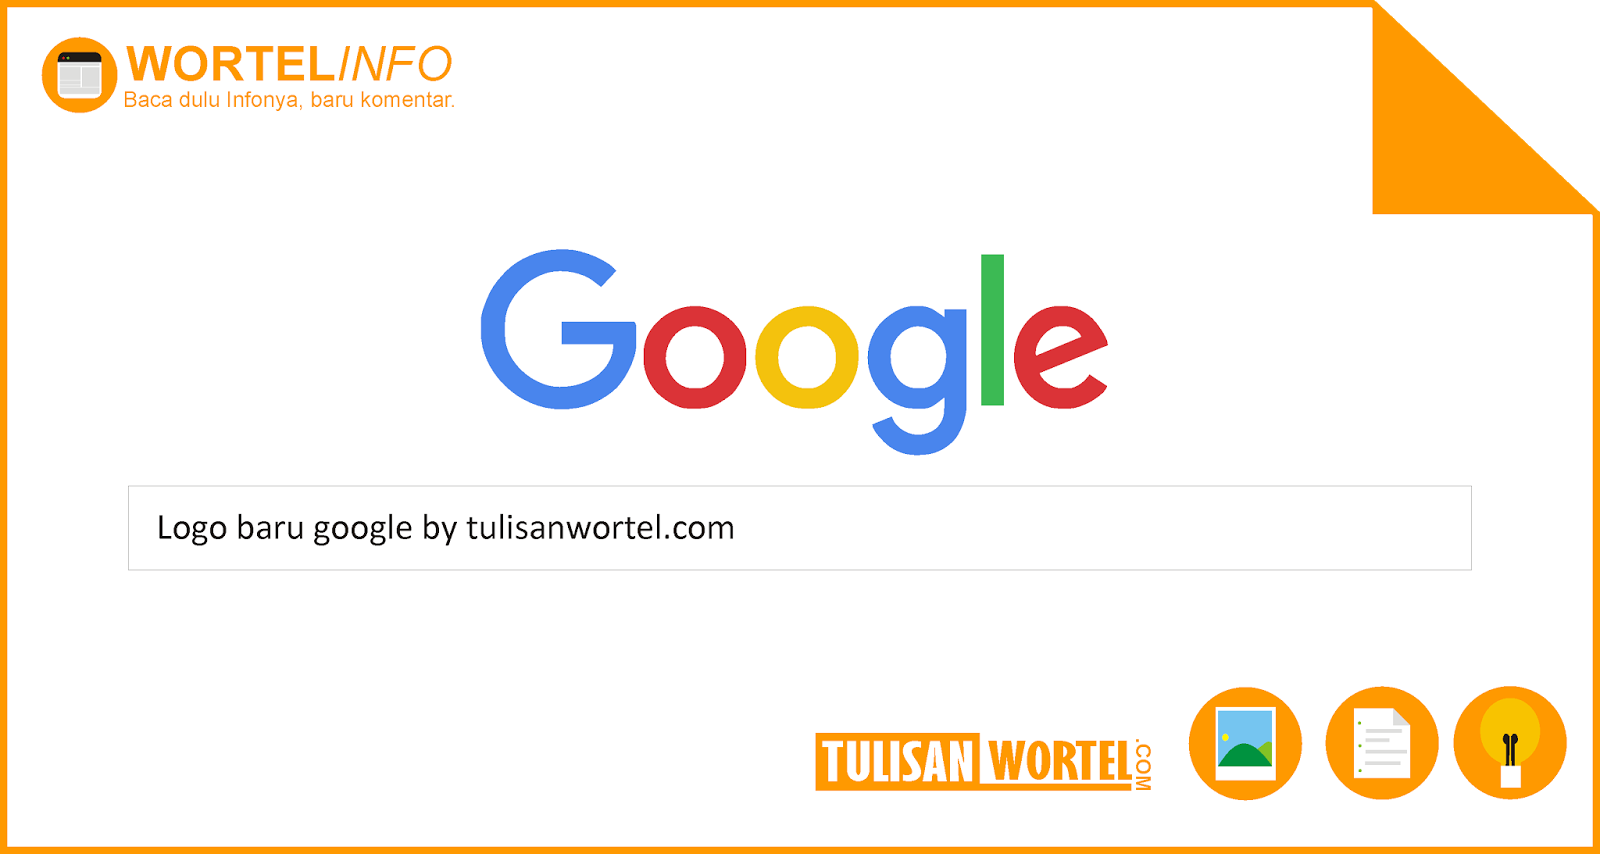 logo baru google tulisan wortel